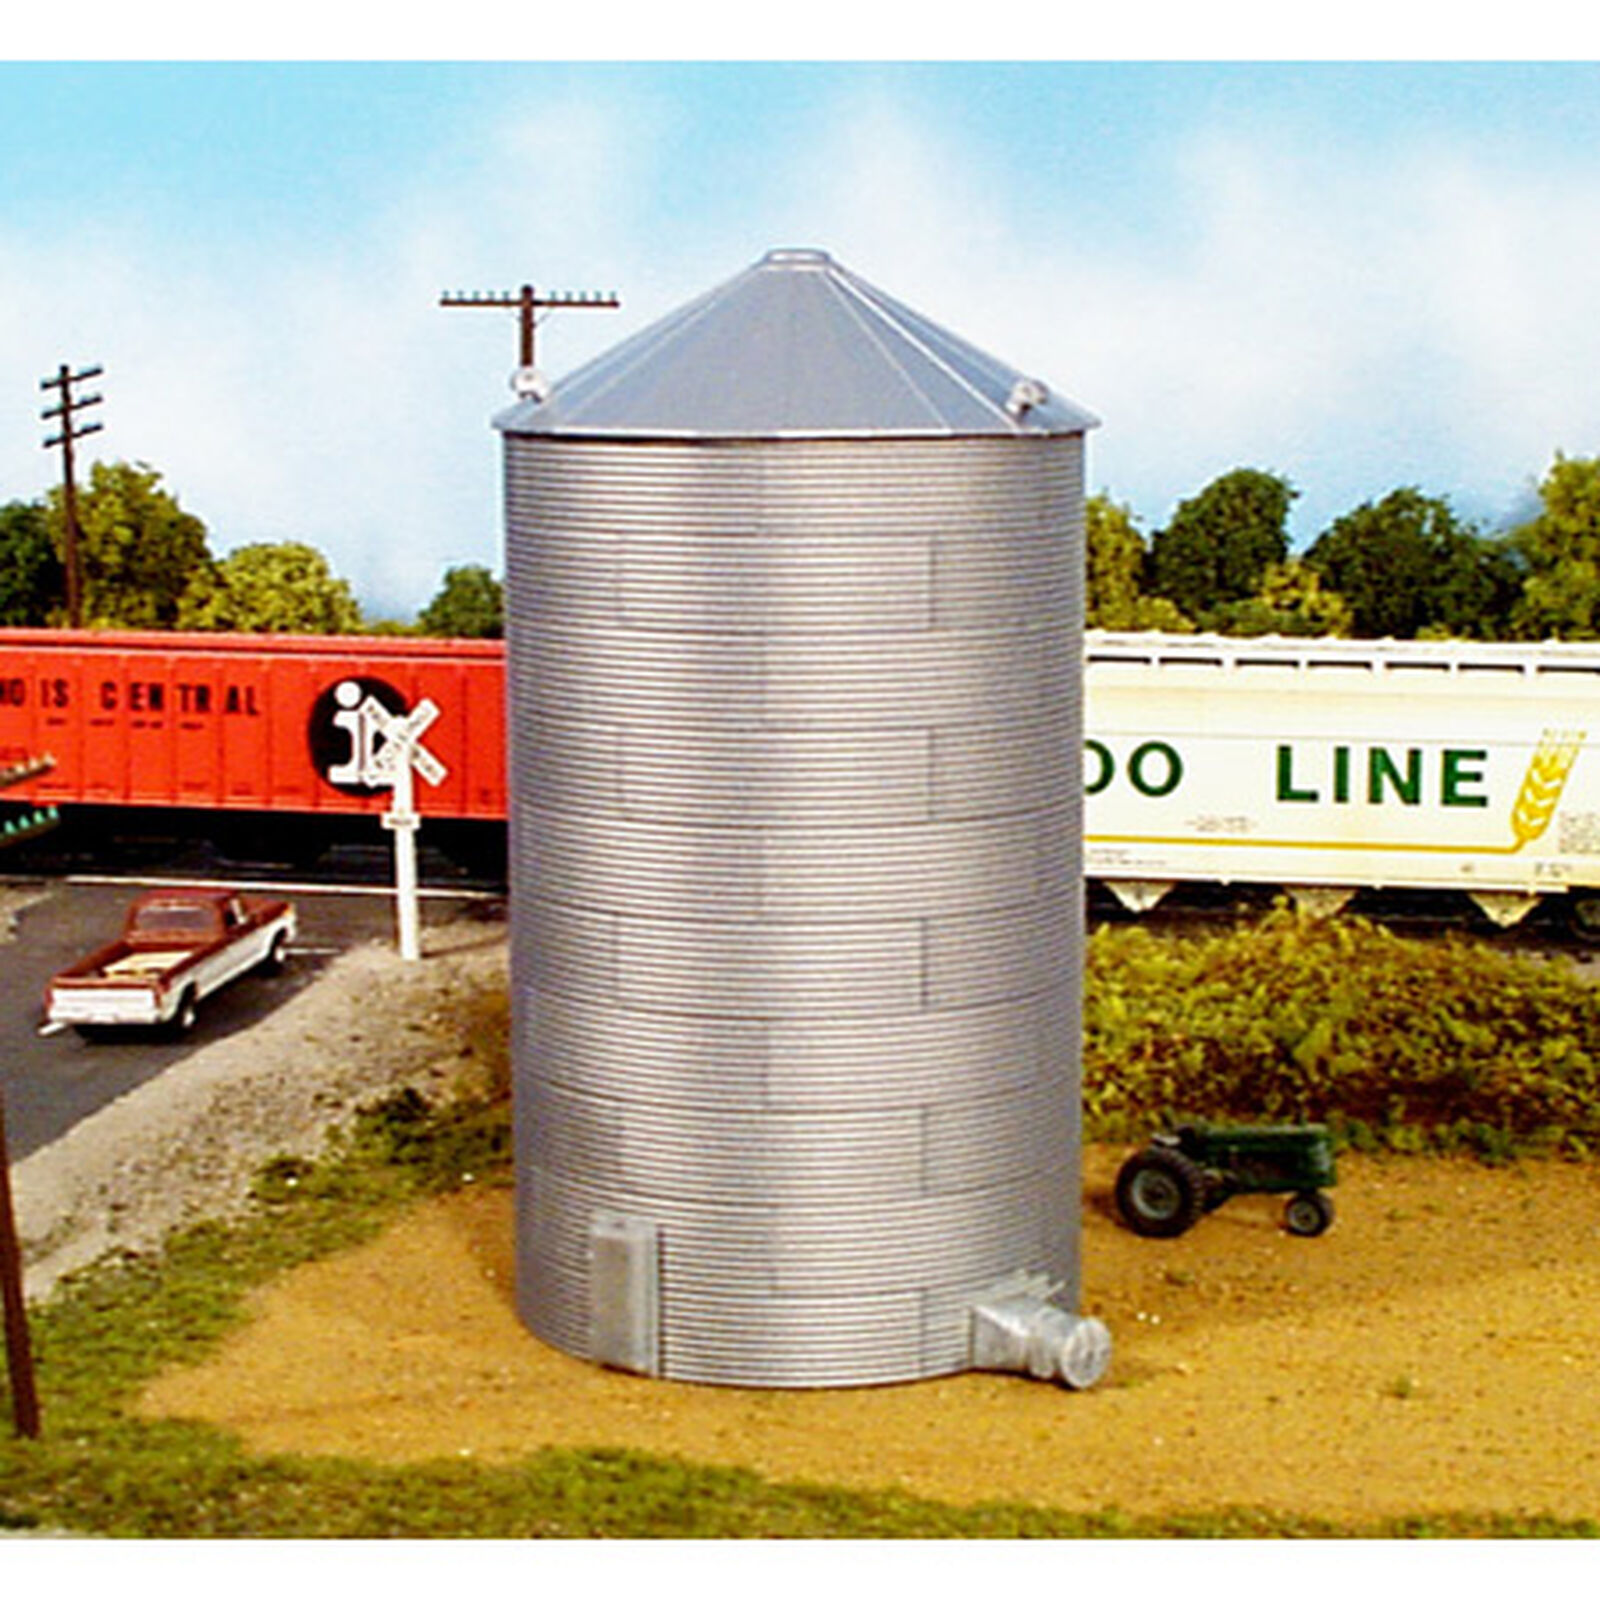 HO KIT 40' Corrugated Grain Bin